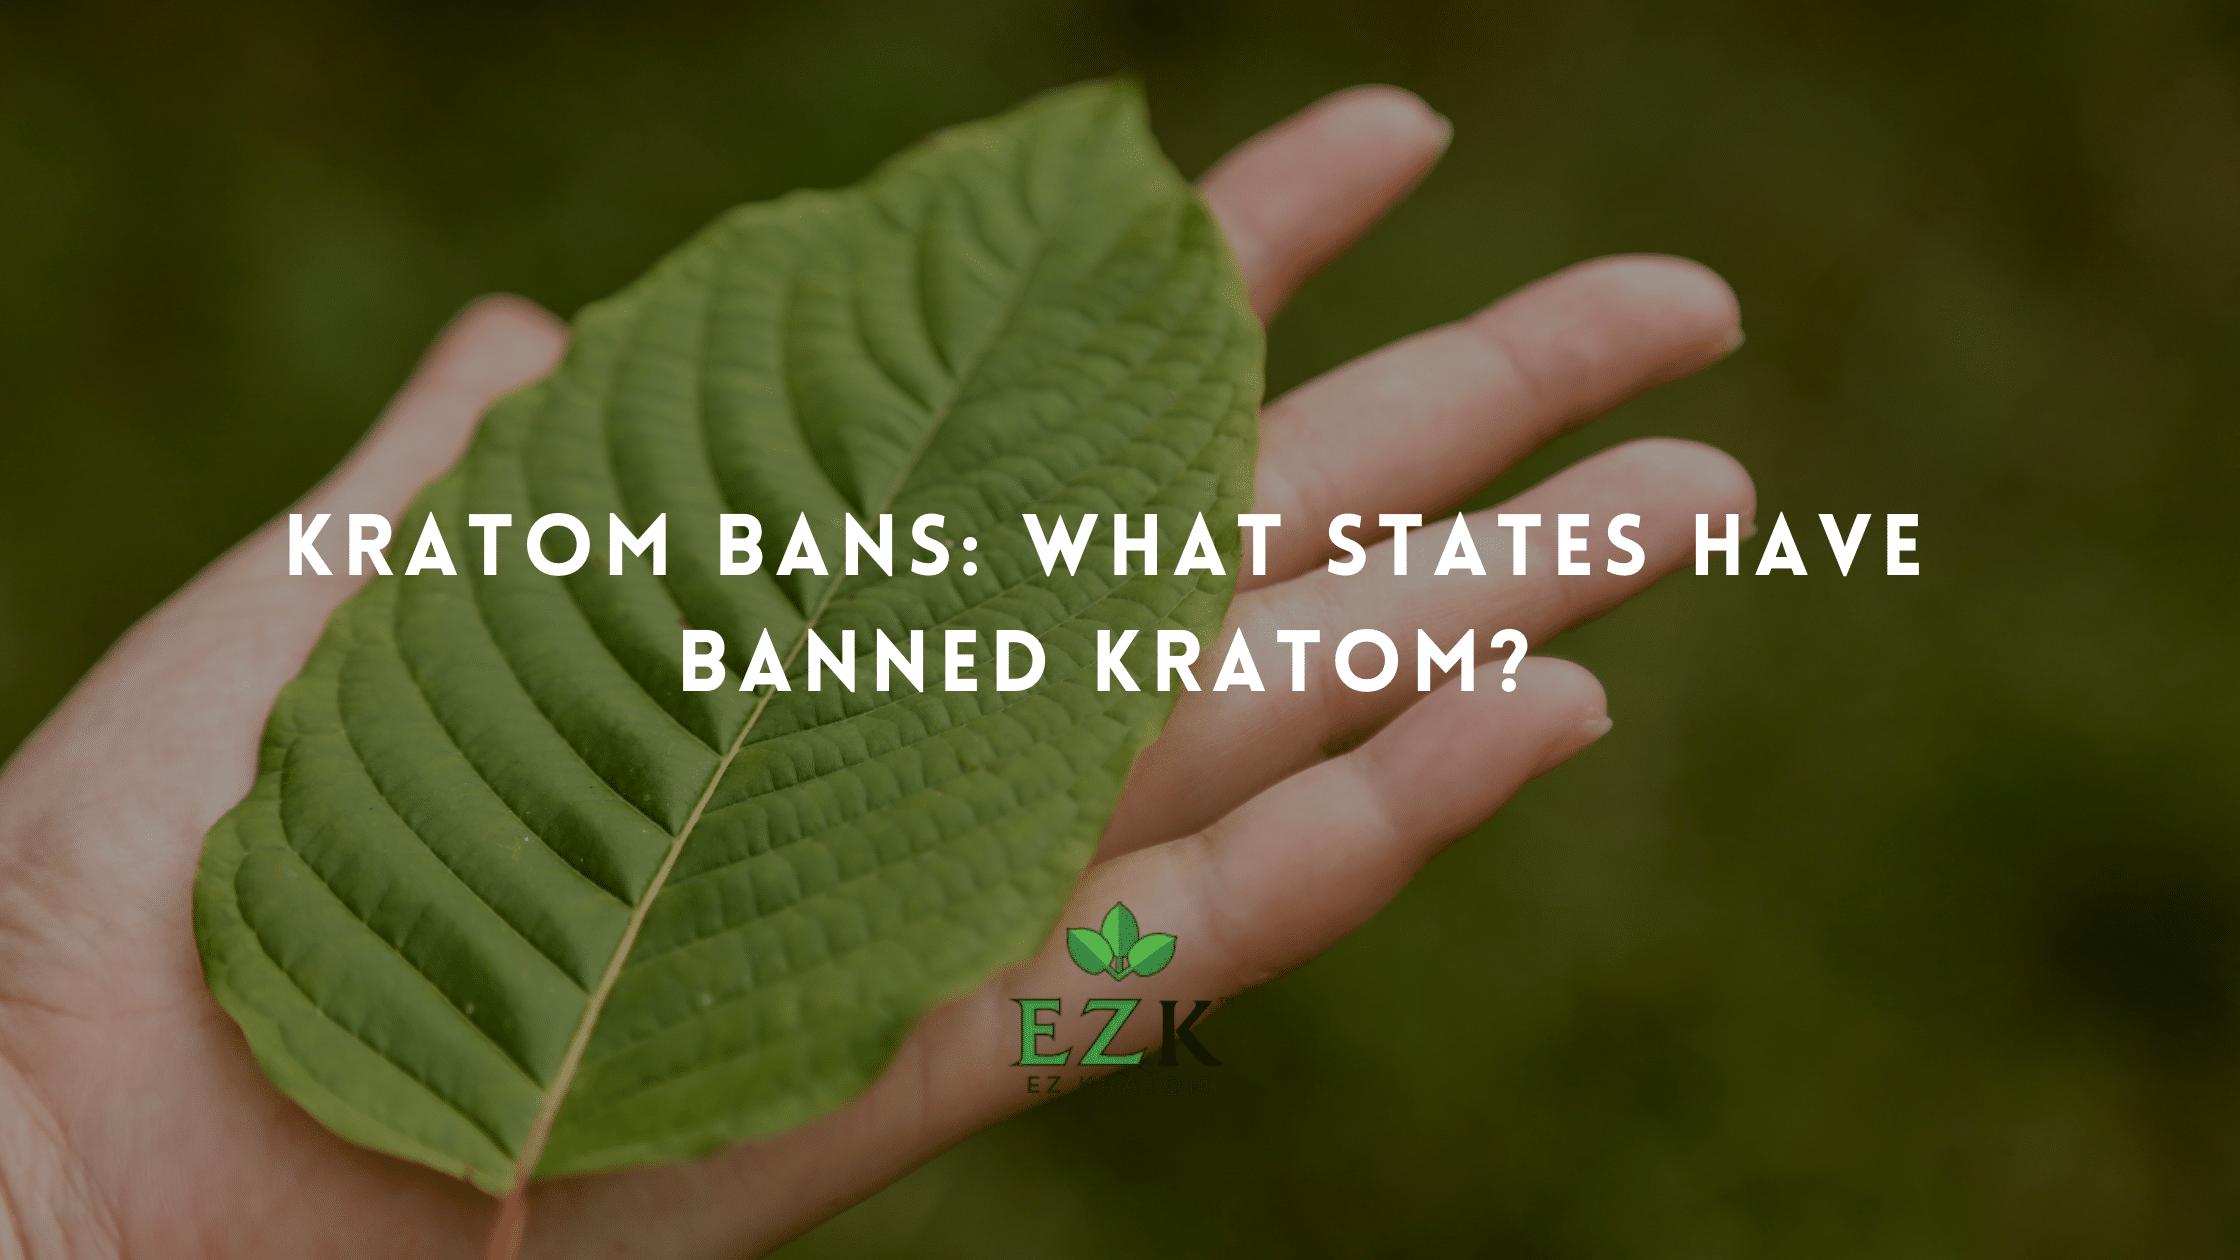 Kratom Bans: What States Have Banned Kratom?